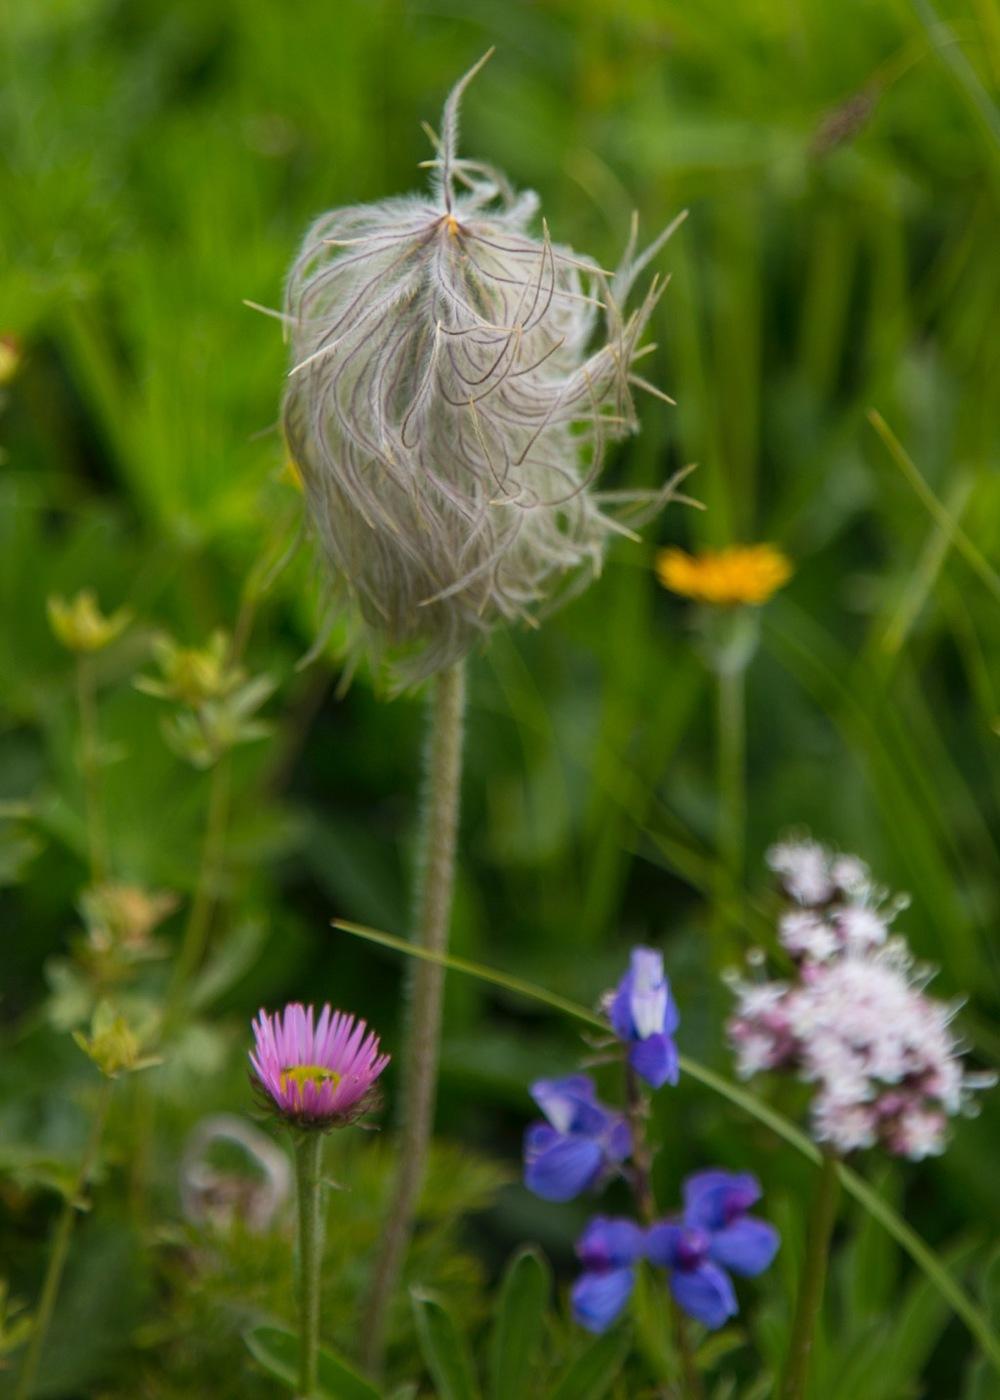 A small floral still life.